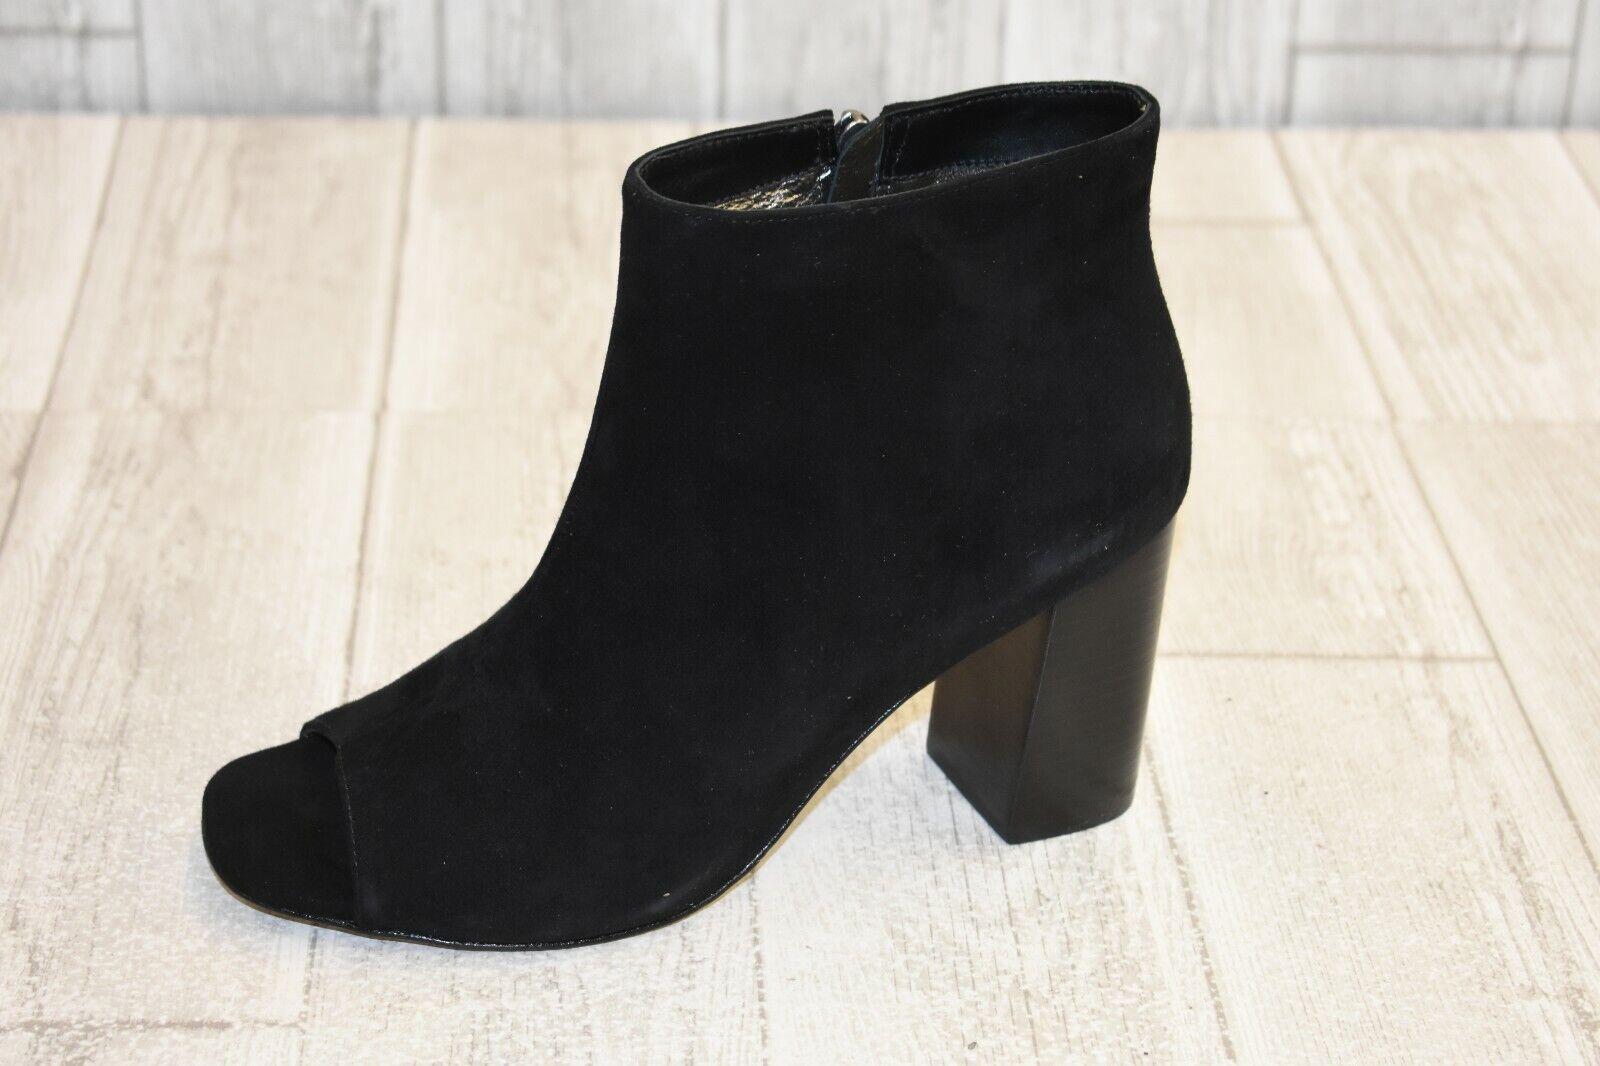 Johnston & Murphy Lizzie Peep Toe Booties - Women's Size 9 M - Black NEW